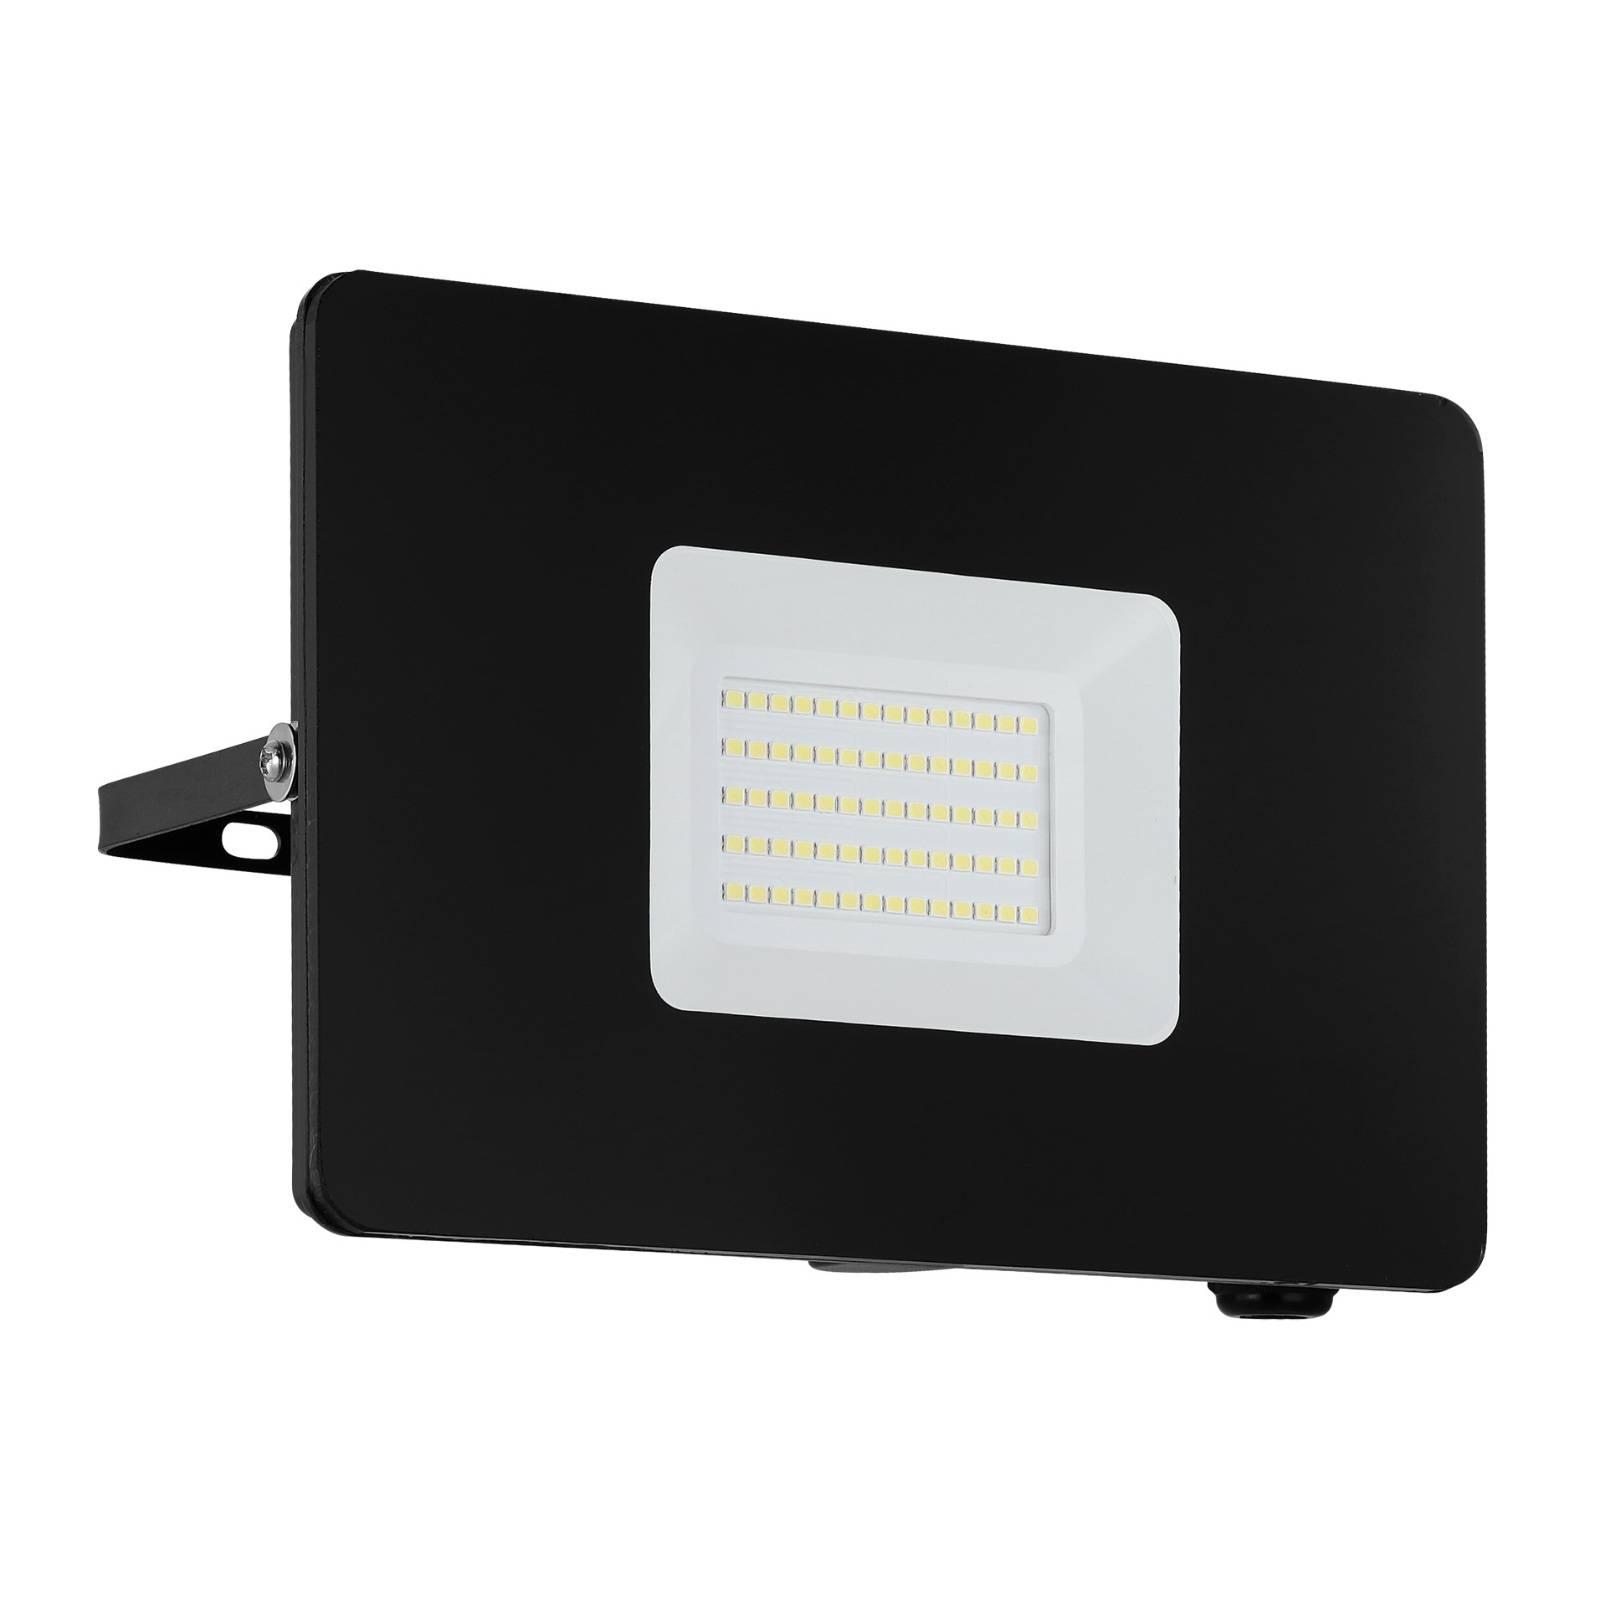 LED-kohdevalaisin ulos Faedo 3, musta, 50 W